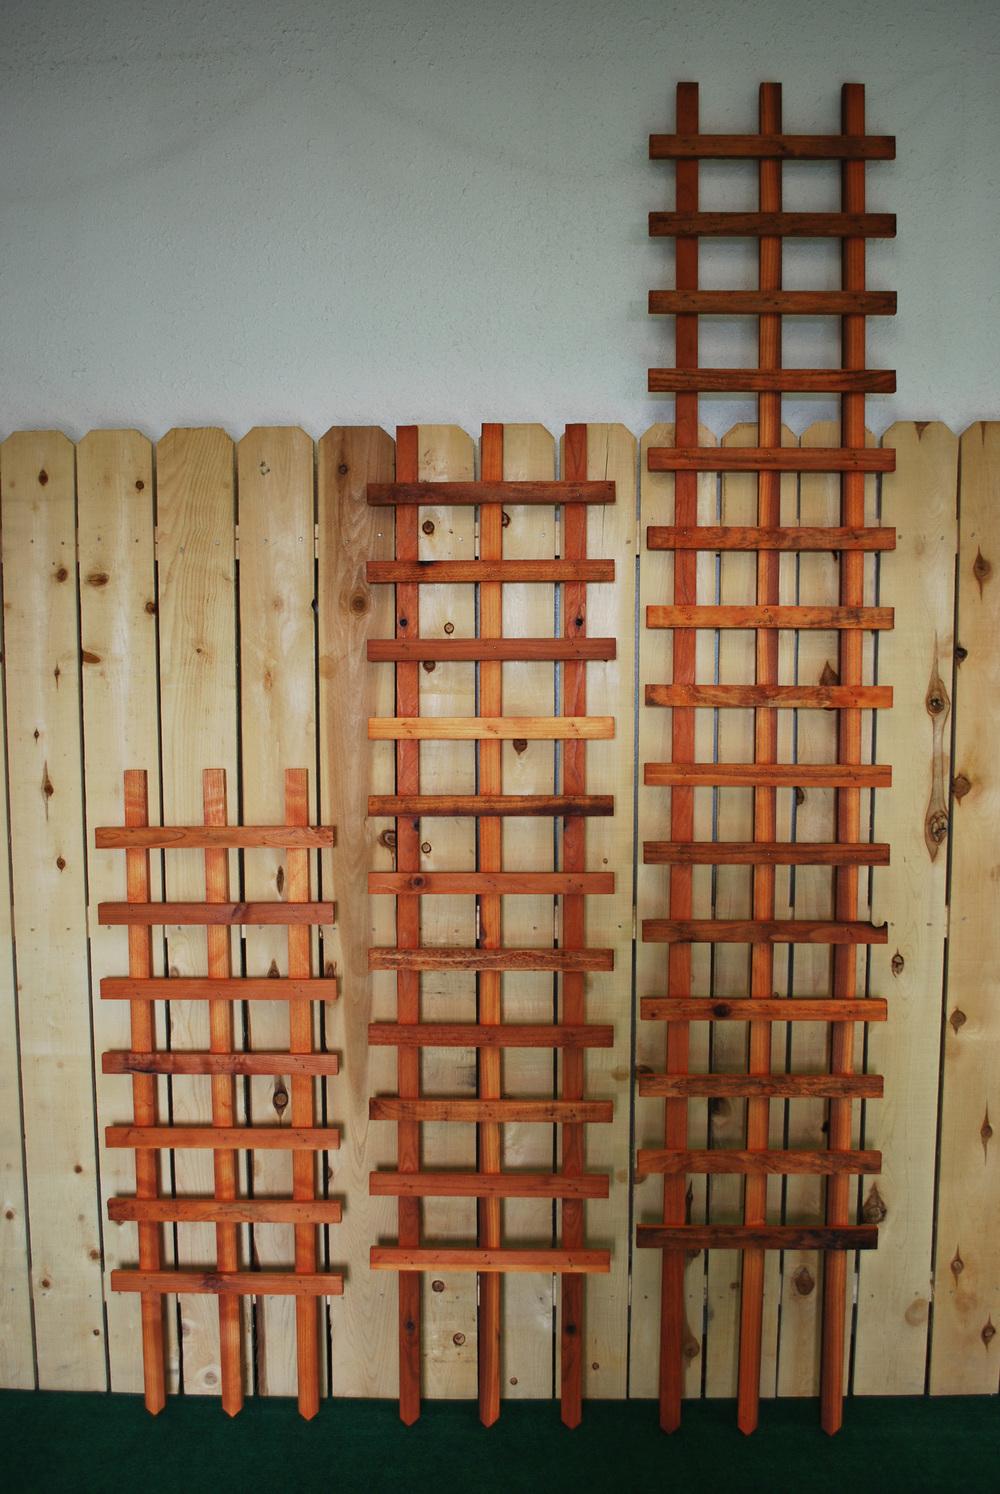 Spec Tre Ladder Trellis The Redwood Store